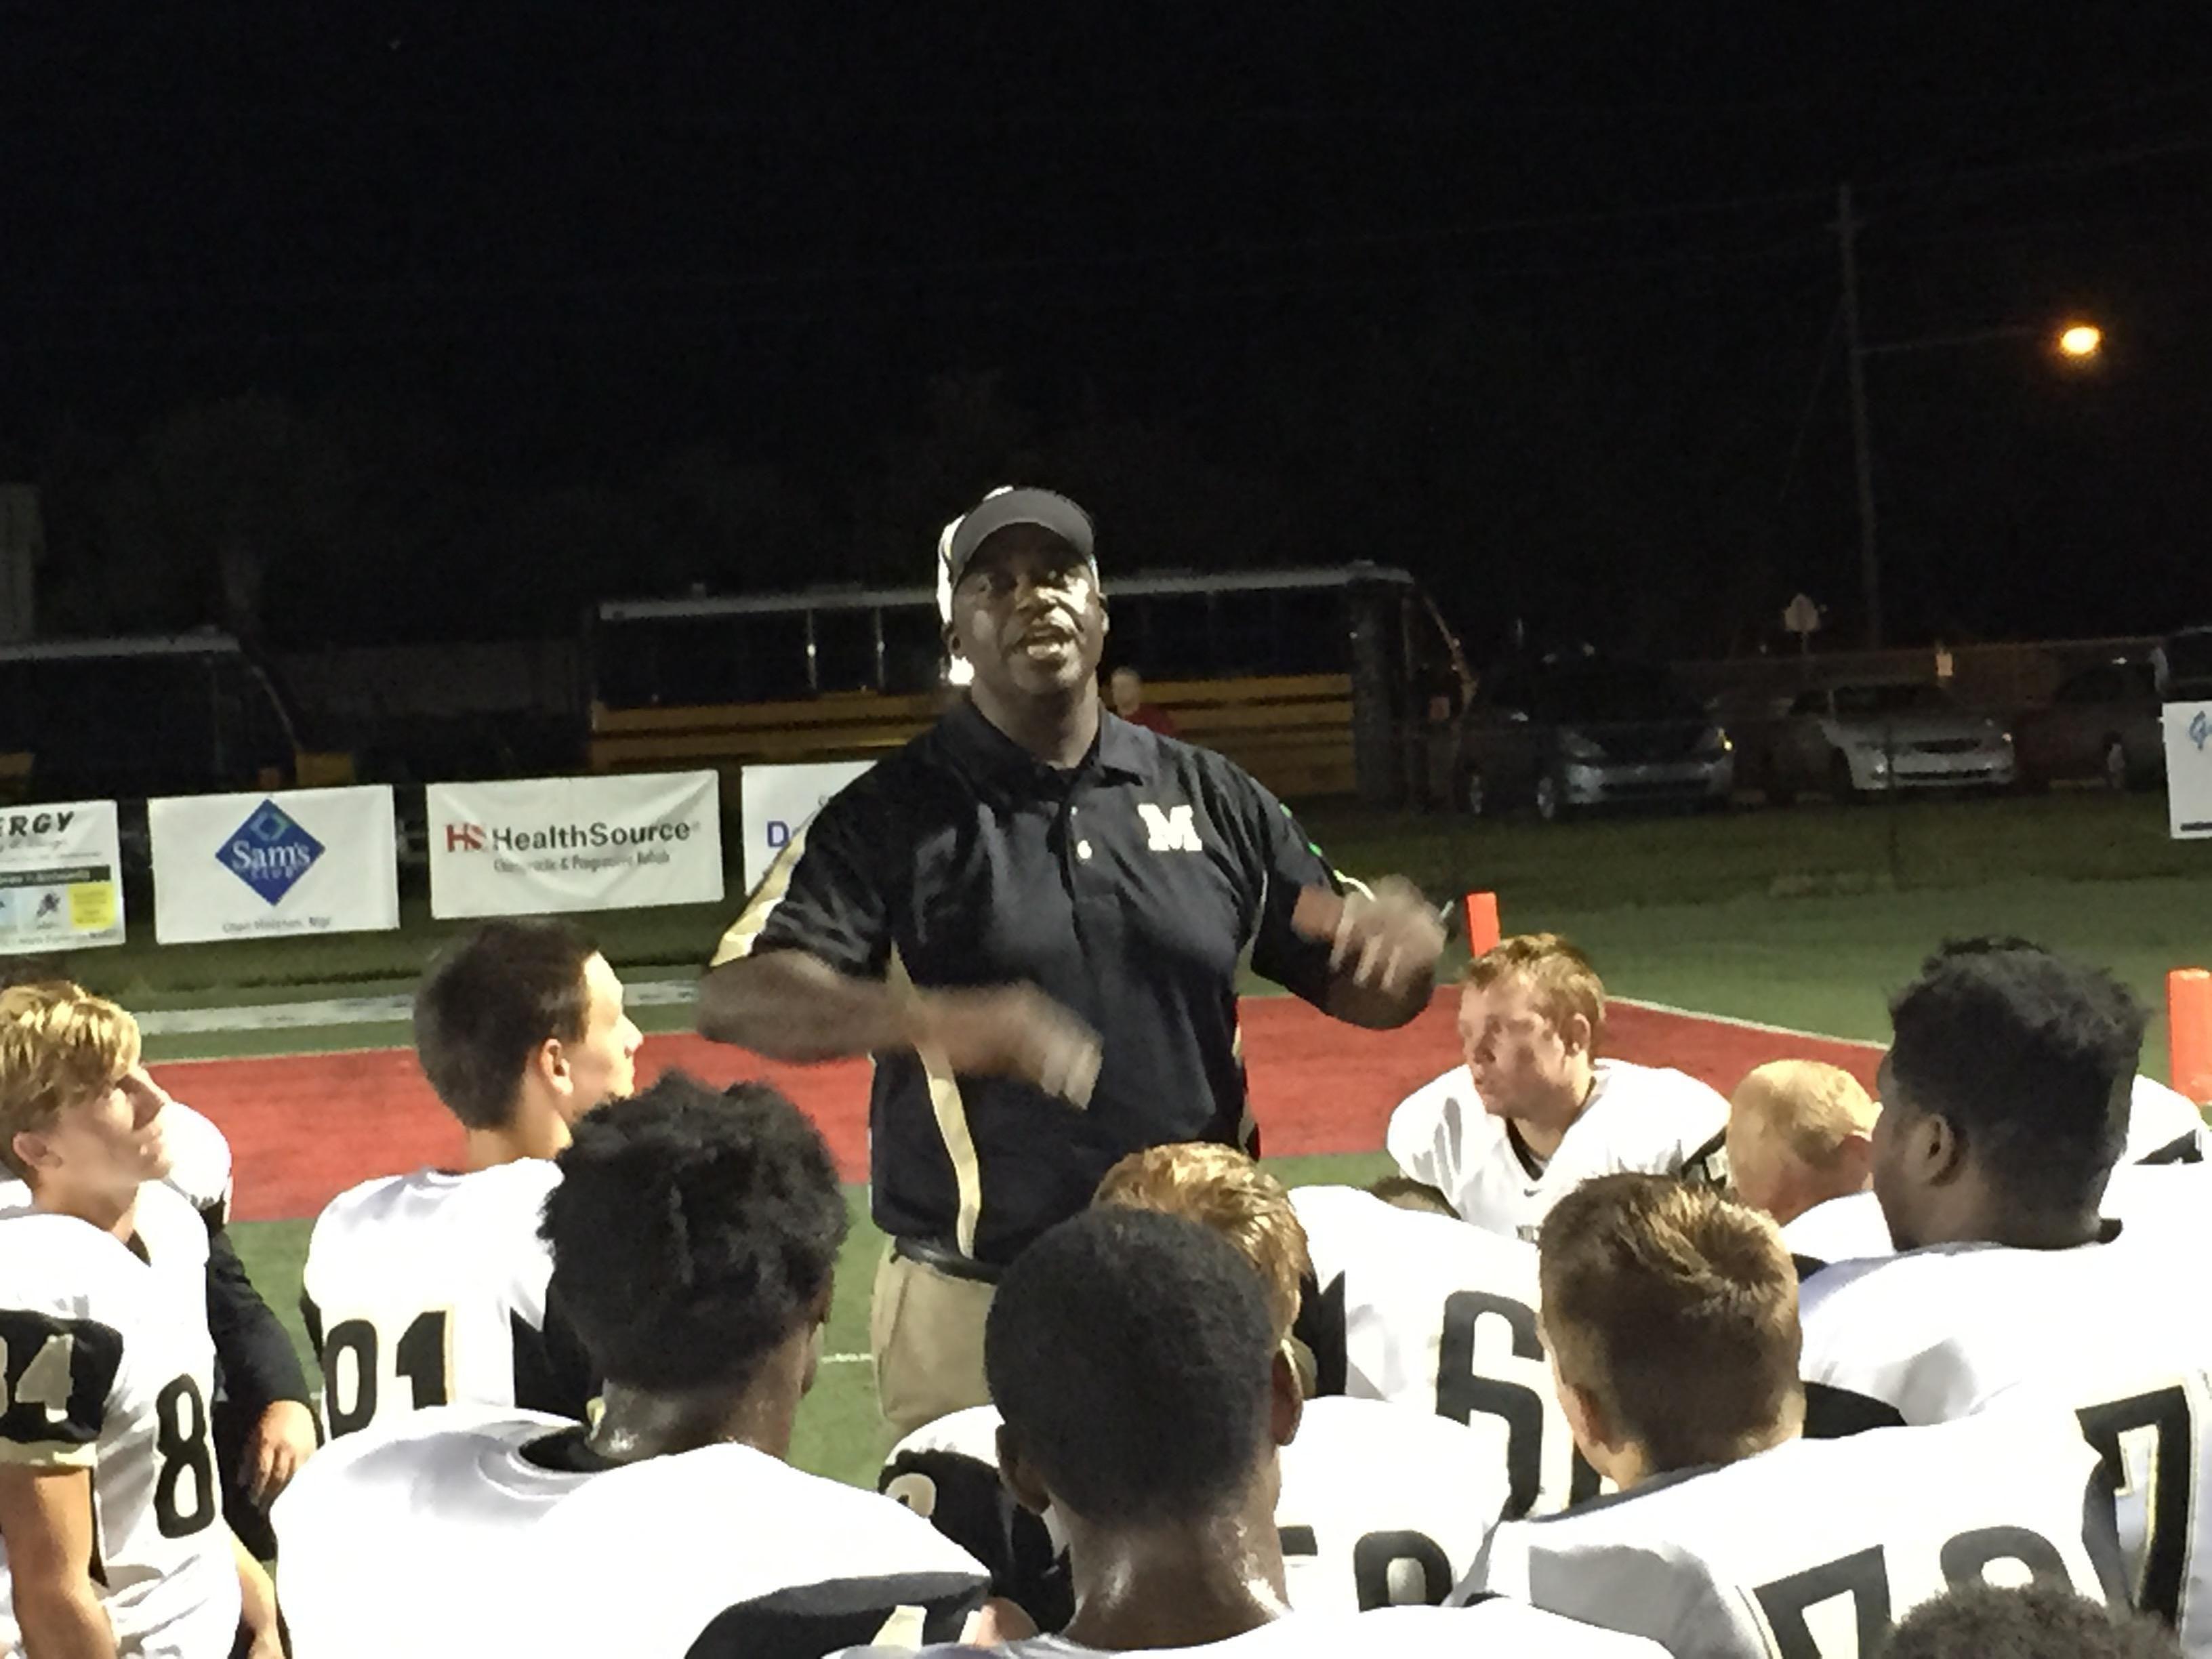 Milton football coach Chafan Marsh talks with his team following Friday night's 38-7 victory against Fort Walton Beach High at Steve Riggs Stadium in Fort Walton Beach.